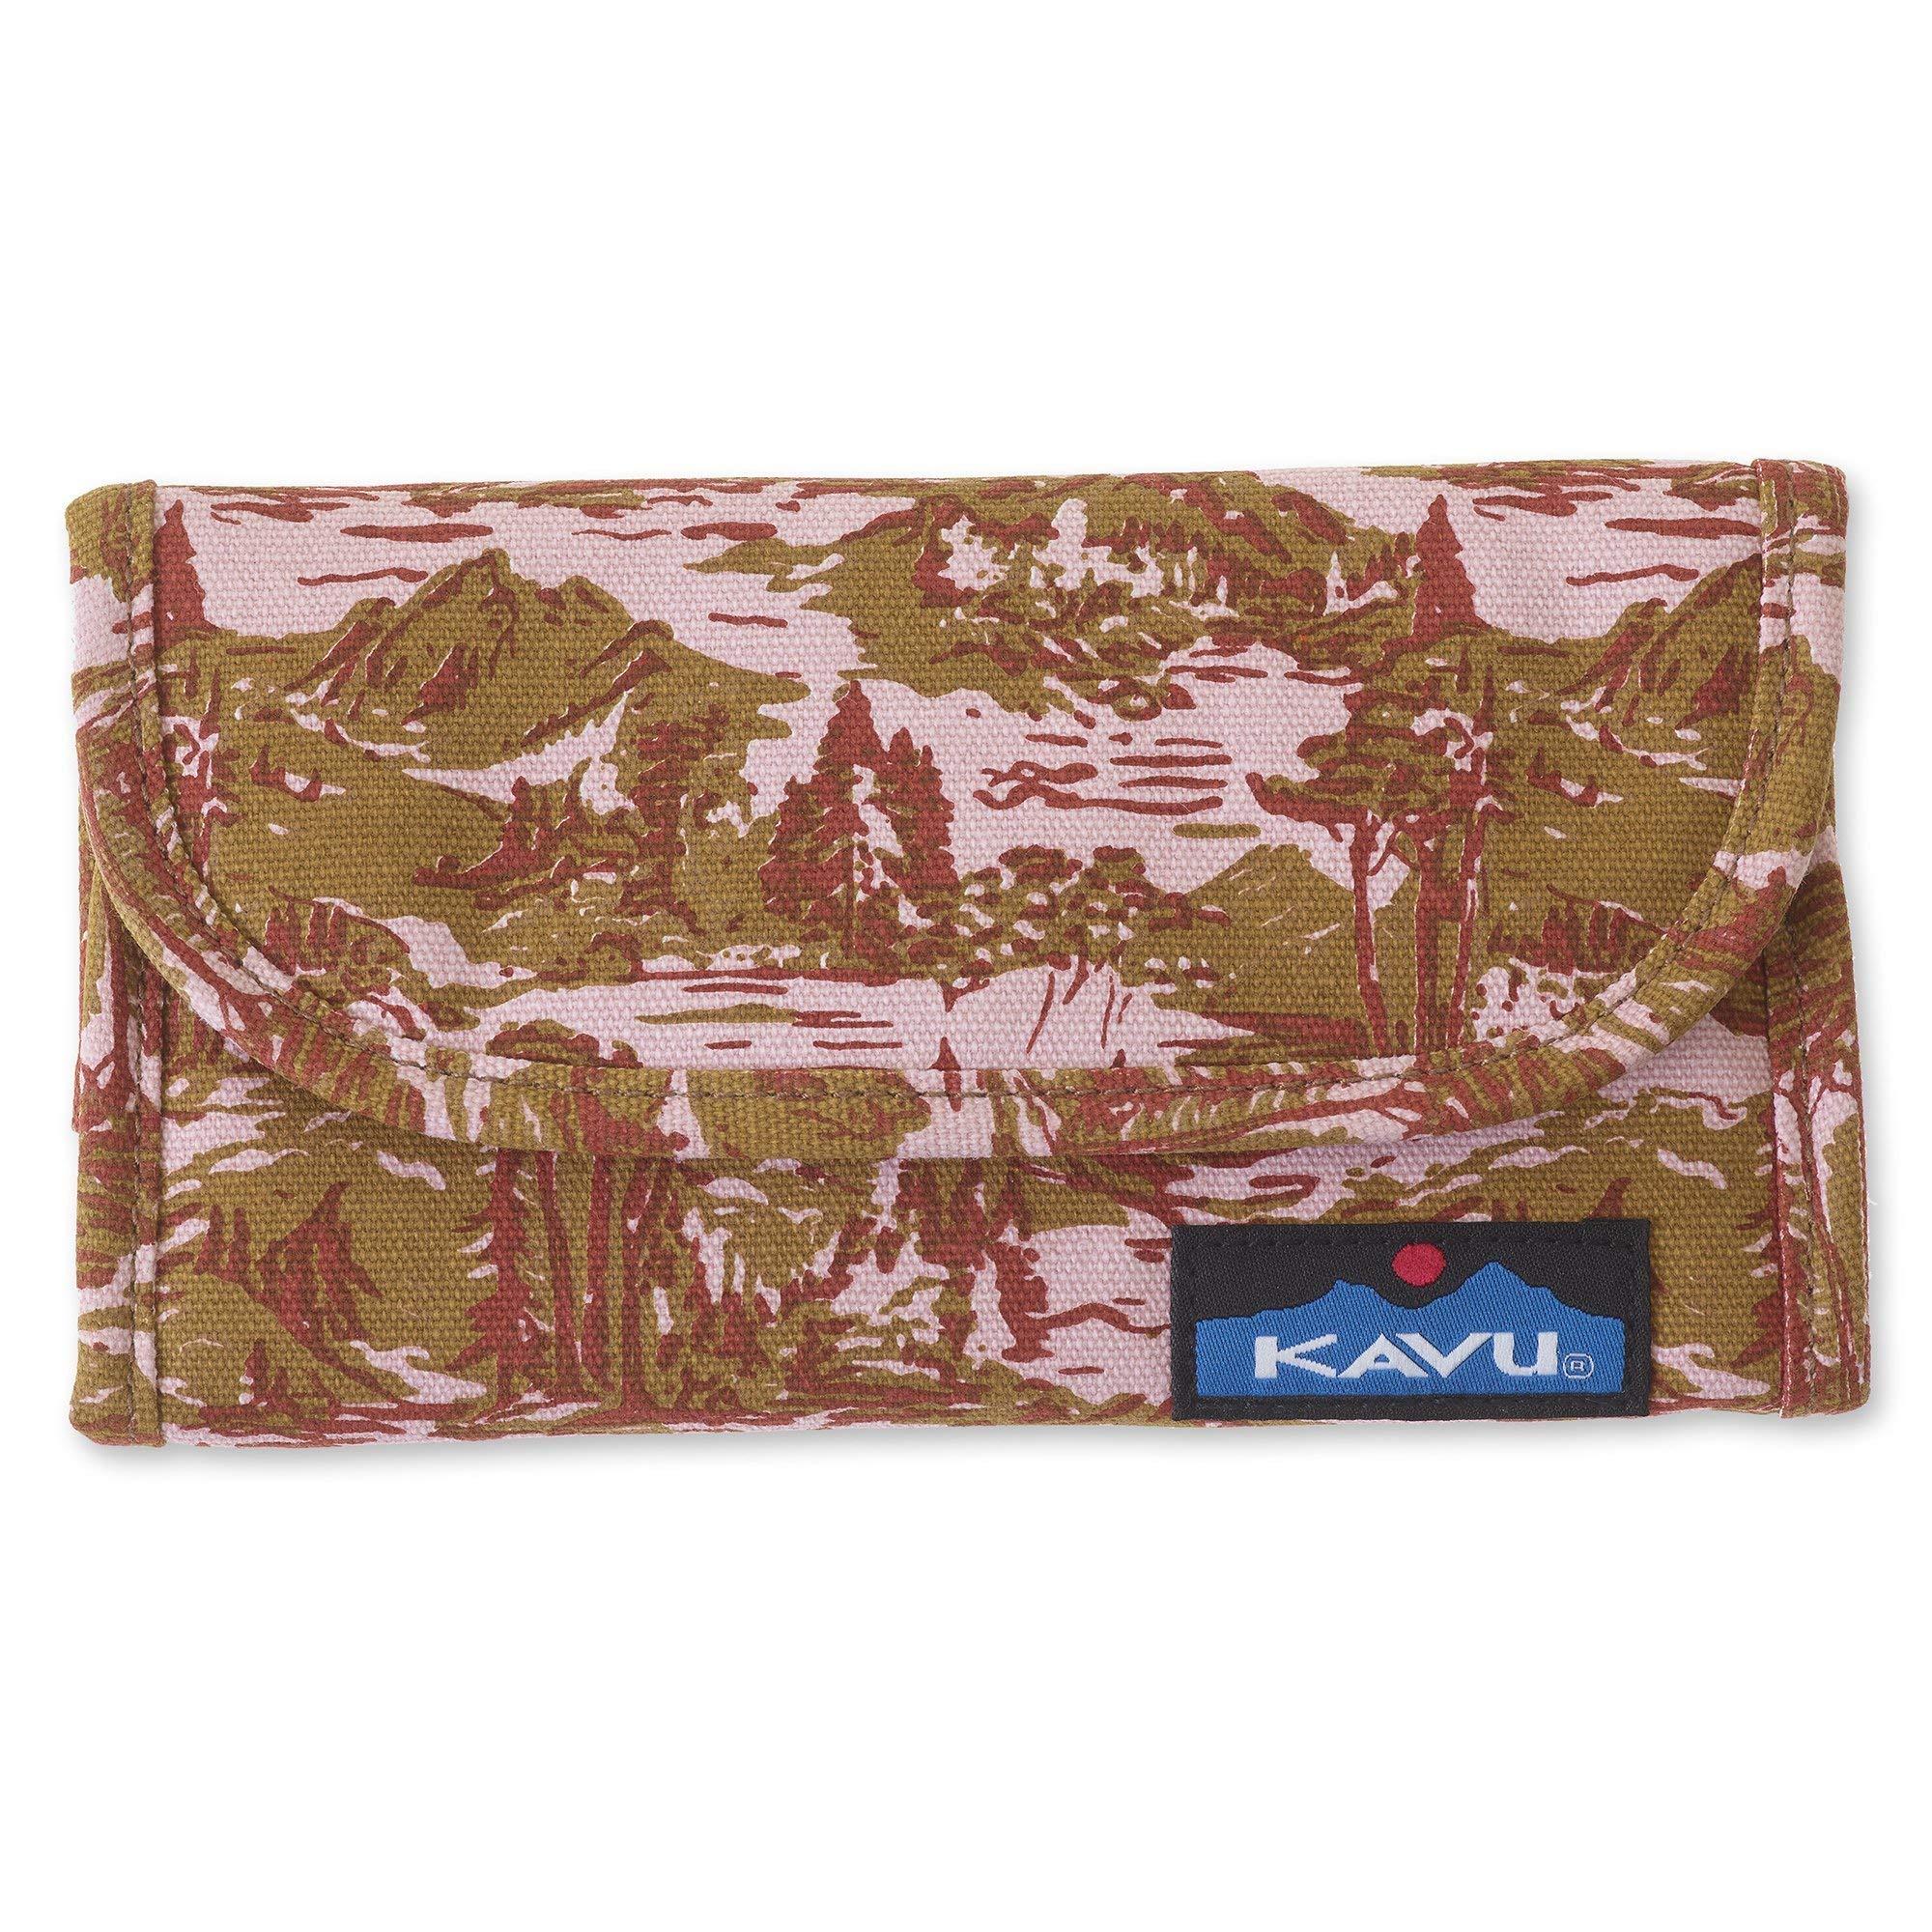 KAVU Big Spender Tri-fold Wallet Womens Clutch Travel Organizer - Blush Landscape by KAVU